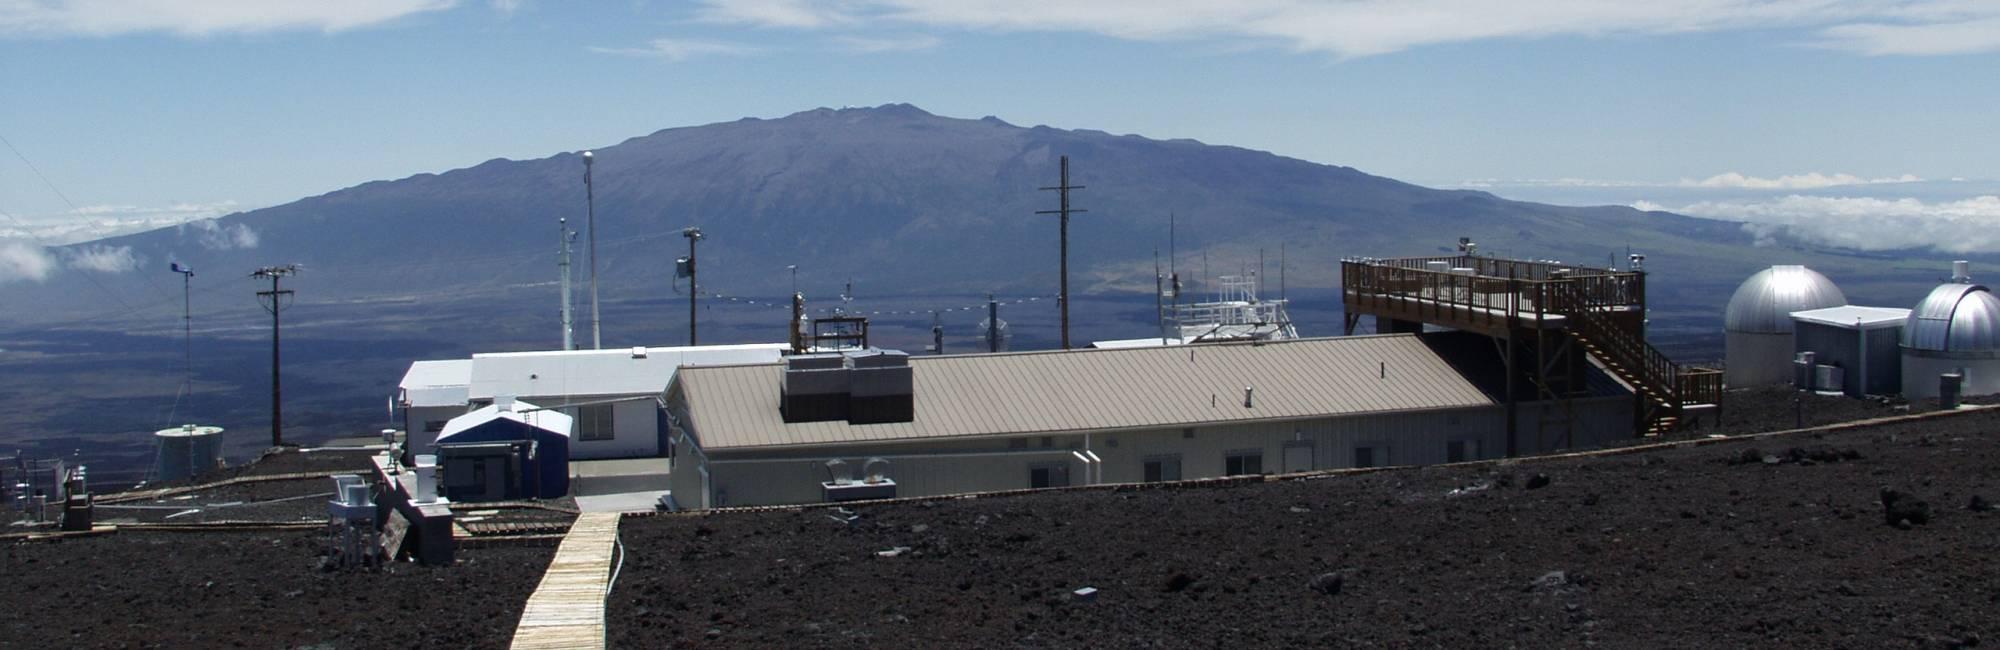 Photo of NOAA's Mauna Loa atmospheric baseline observatory, located at 11,000 feet elevation on Hawaii's tallest mountain.